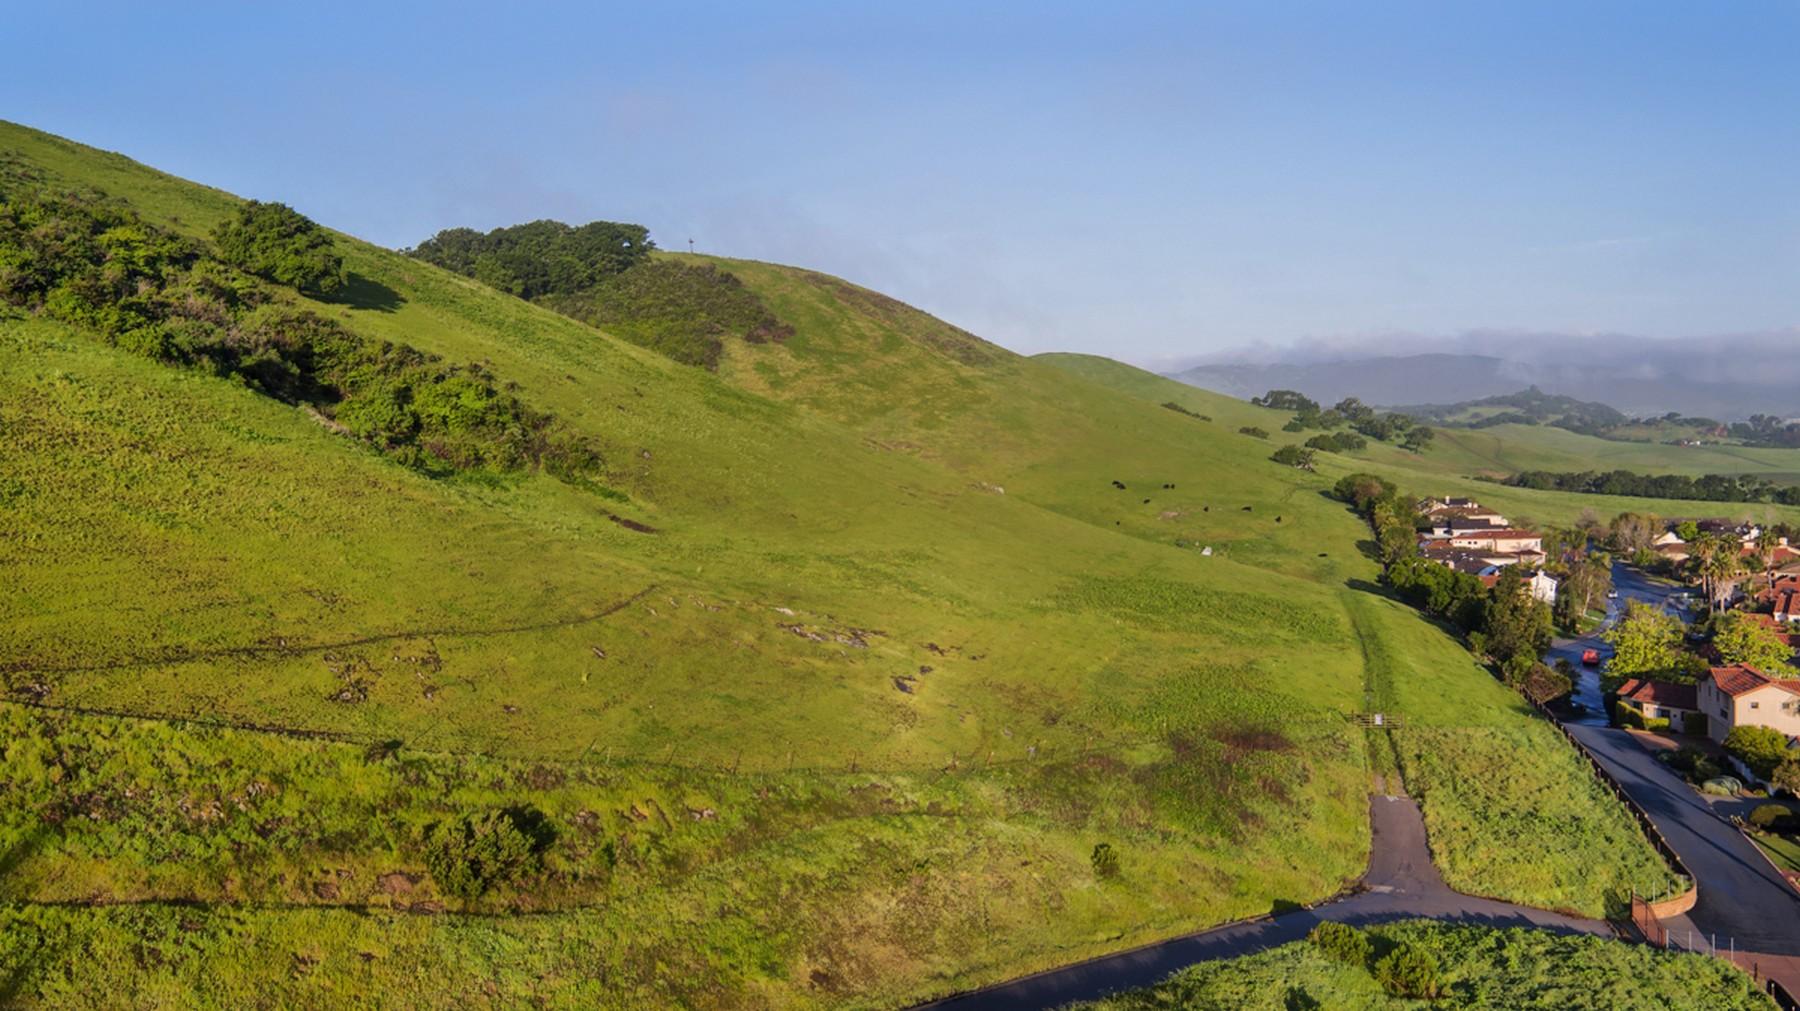 Land for Sale at 11+ Acres overlooking Edna Valley & City of SLO Whiskey Run Lane San Luis Obispo, California 93401 United States